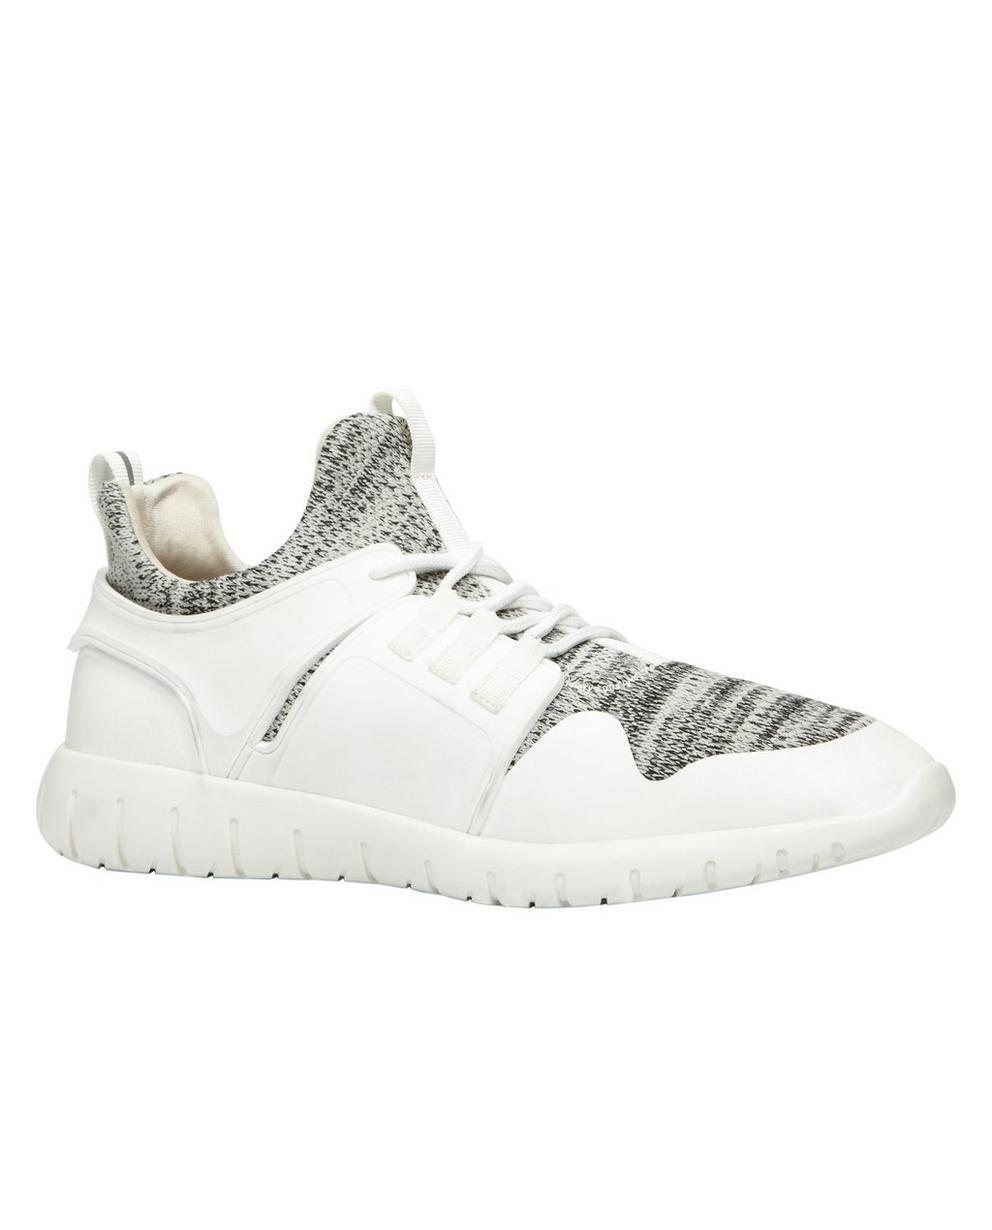 Witte sportieve sneakers - in 2 materialen - Call it Spring